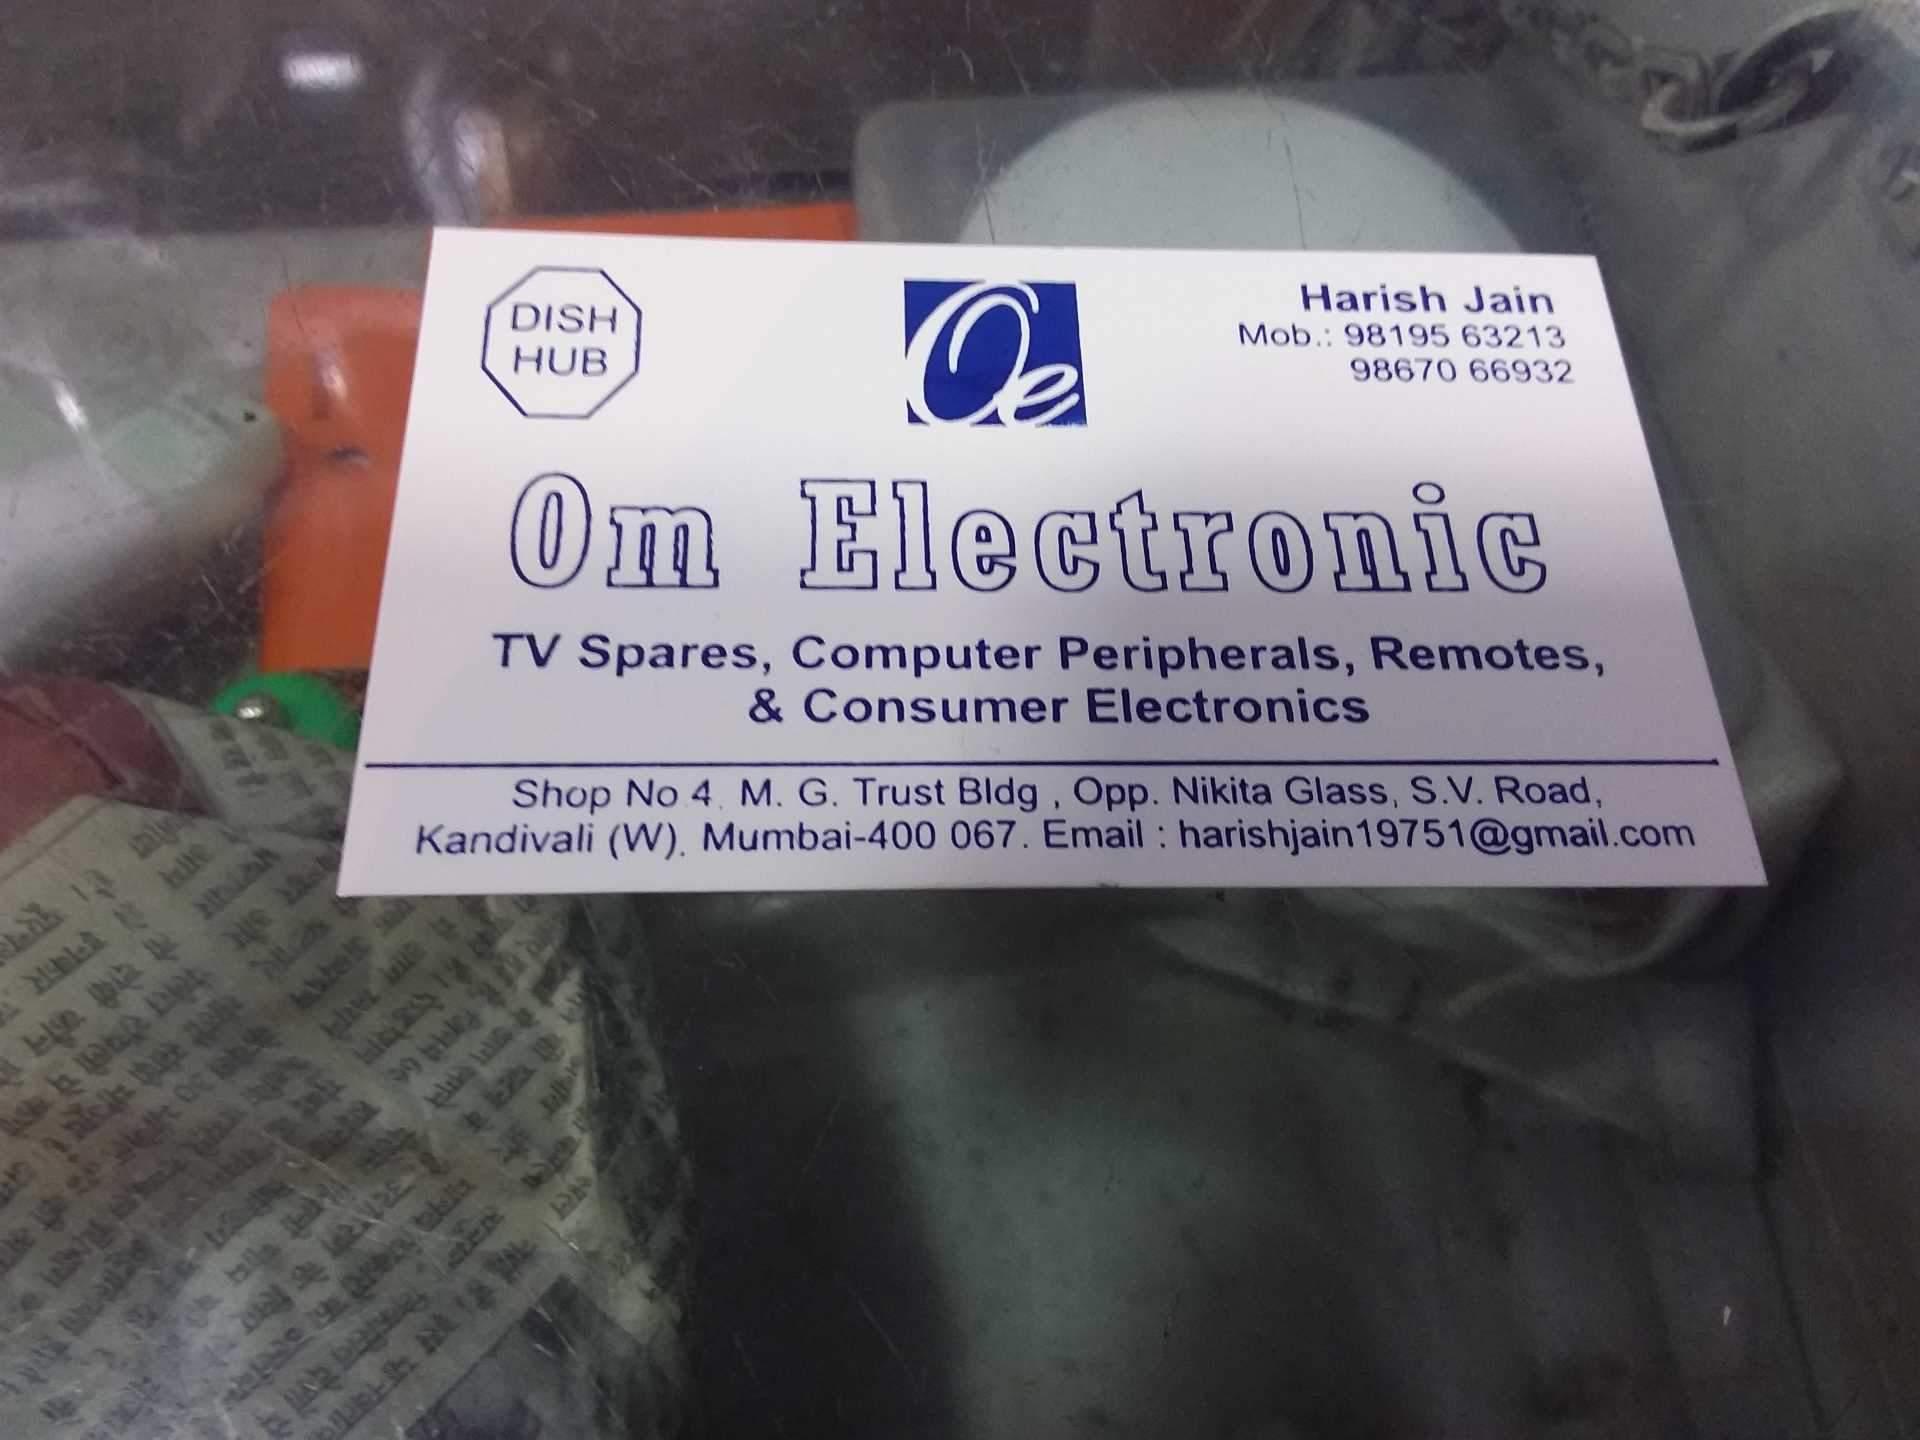 Top Airtel Set Top Box Remote Control Dealers in Kandivali